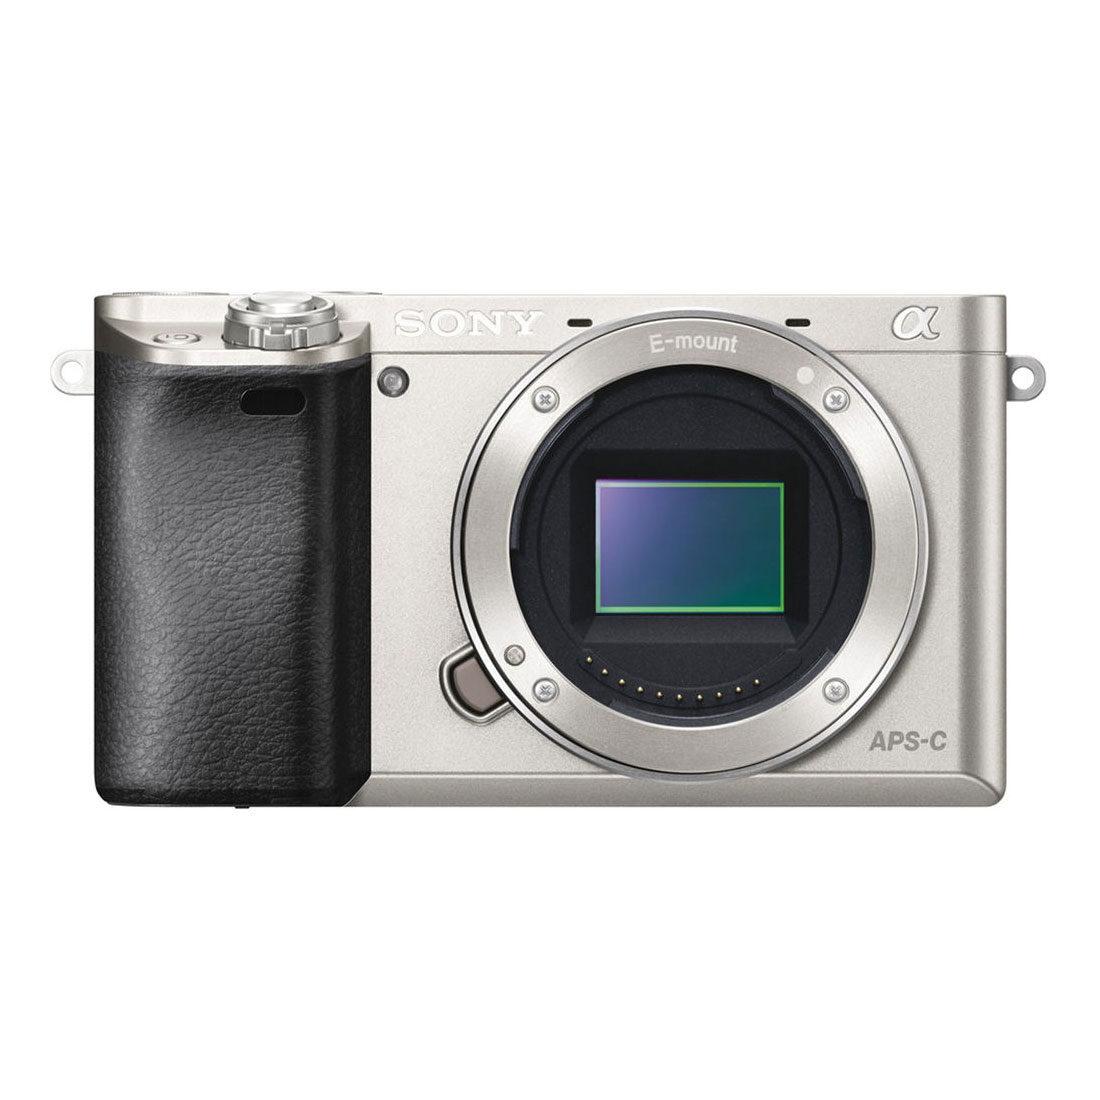 Sony Alpha A6000 ICL systeemcamera Body Zilver <br/>€ 359.00 <br/> <a href='https://www.cameranu.nl/fotografie/?tt=12190_474631_241358_&r=https%3A%2F%2Fwww.cameranu.nl%2Fnl%2Fp1585185%2Fsony-alpha-a6000-icl-systeemcamera-body-zilver%3Fchannable%3De10841.MTU4NTE4NQ%26utm_campaign%3D%26utm_content%3DSony%2Bsysteemcamera%26utm_source%3DTradetracker%26utm_medium%3Dcpc%26utm_term%3DDigitale%2Bcamera%26apos%3Bs' target='_blank'>naar de winkel</a>